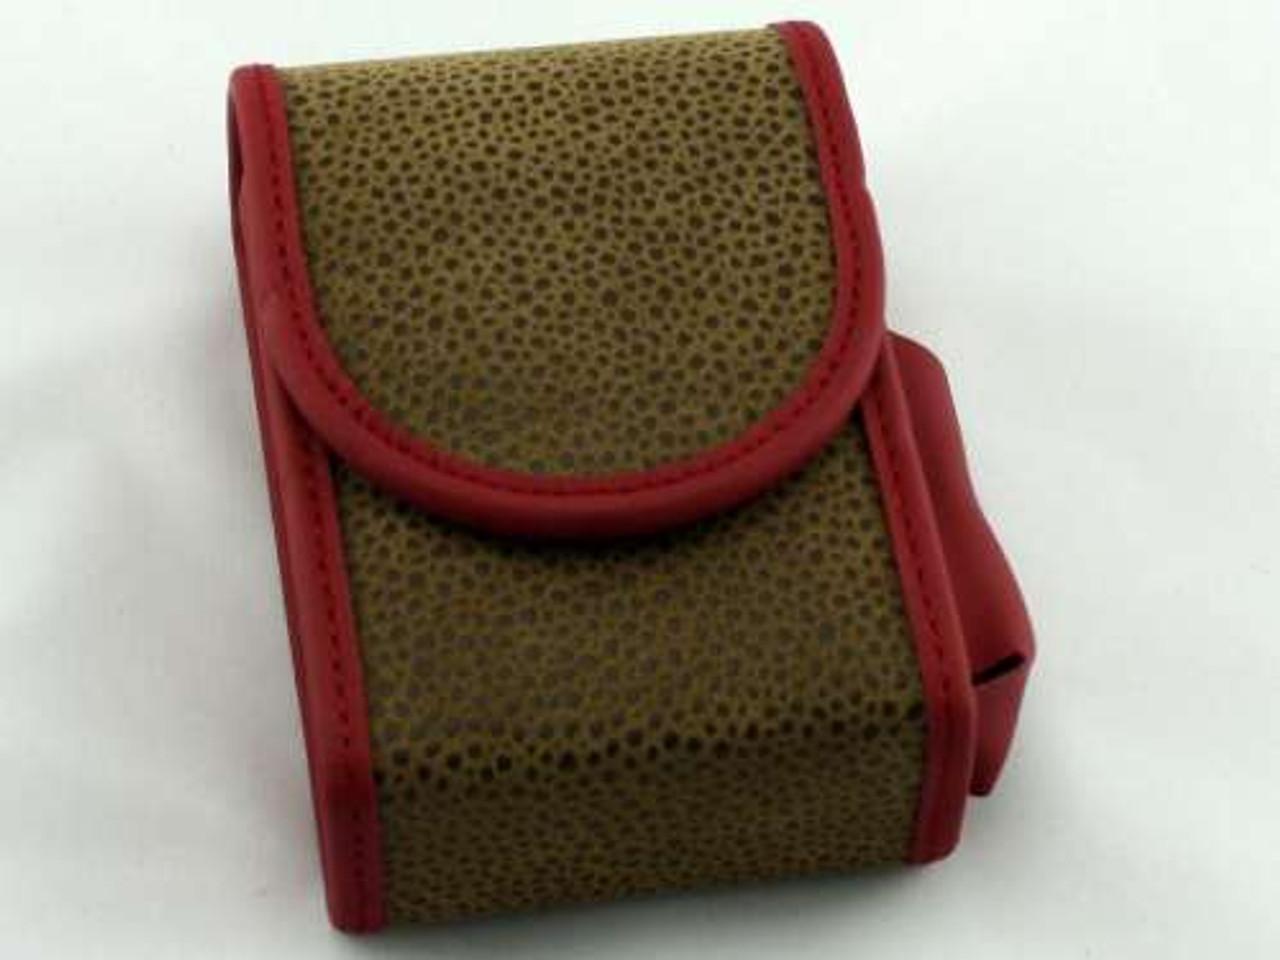 Ashebury Leather Cigarette Pack Holder